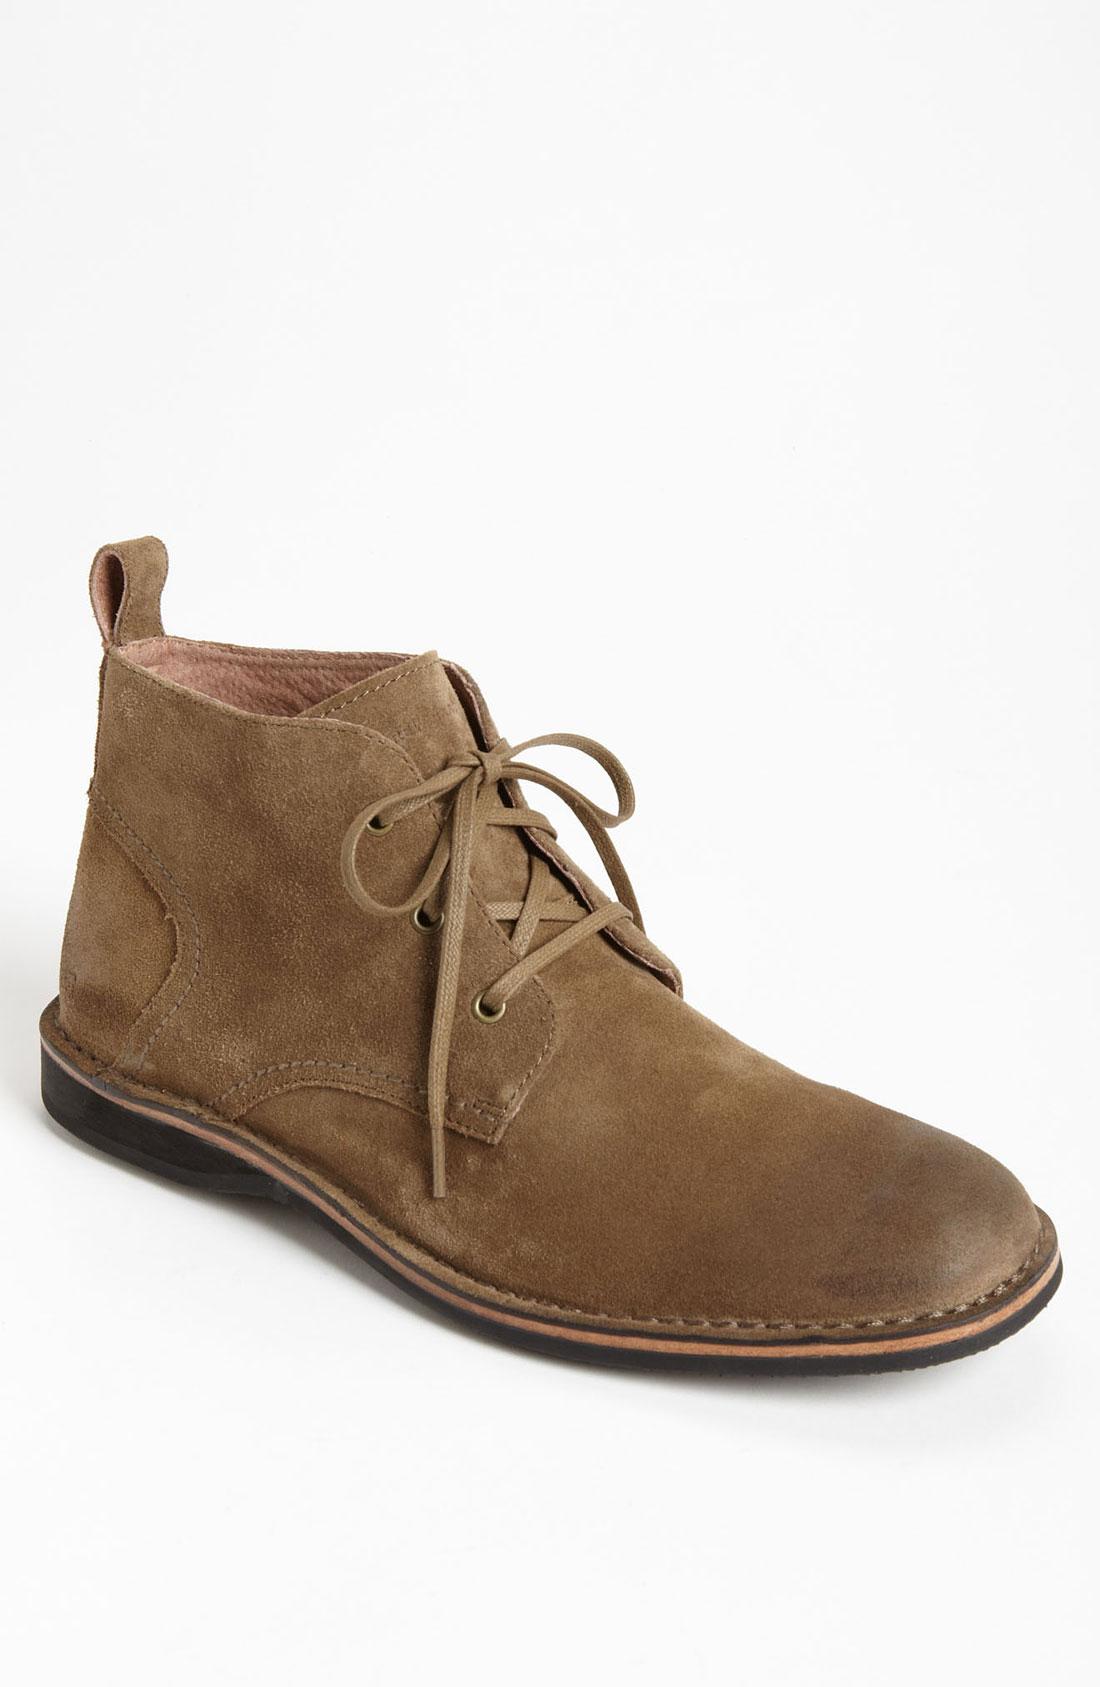 chukka boots men andrew marc u0027dorchesteru0027 chukka boot (men) | nordstrom FICXKIB